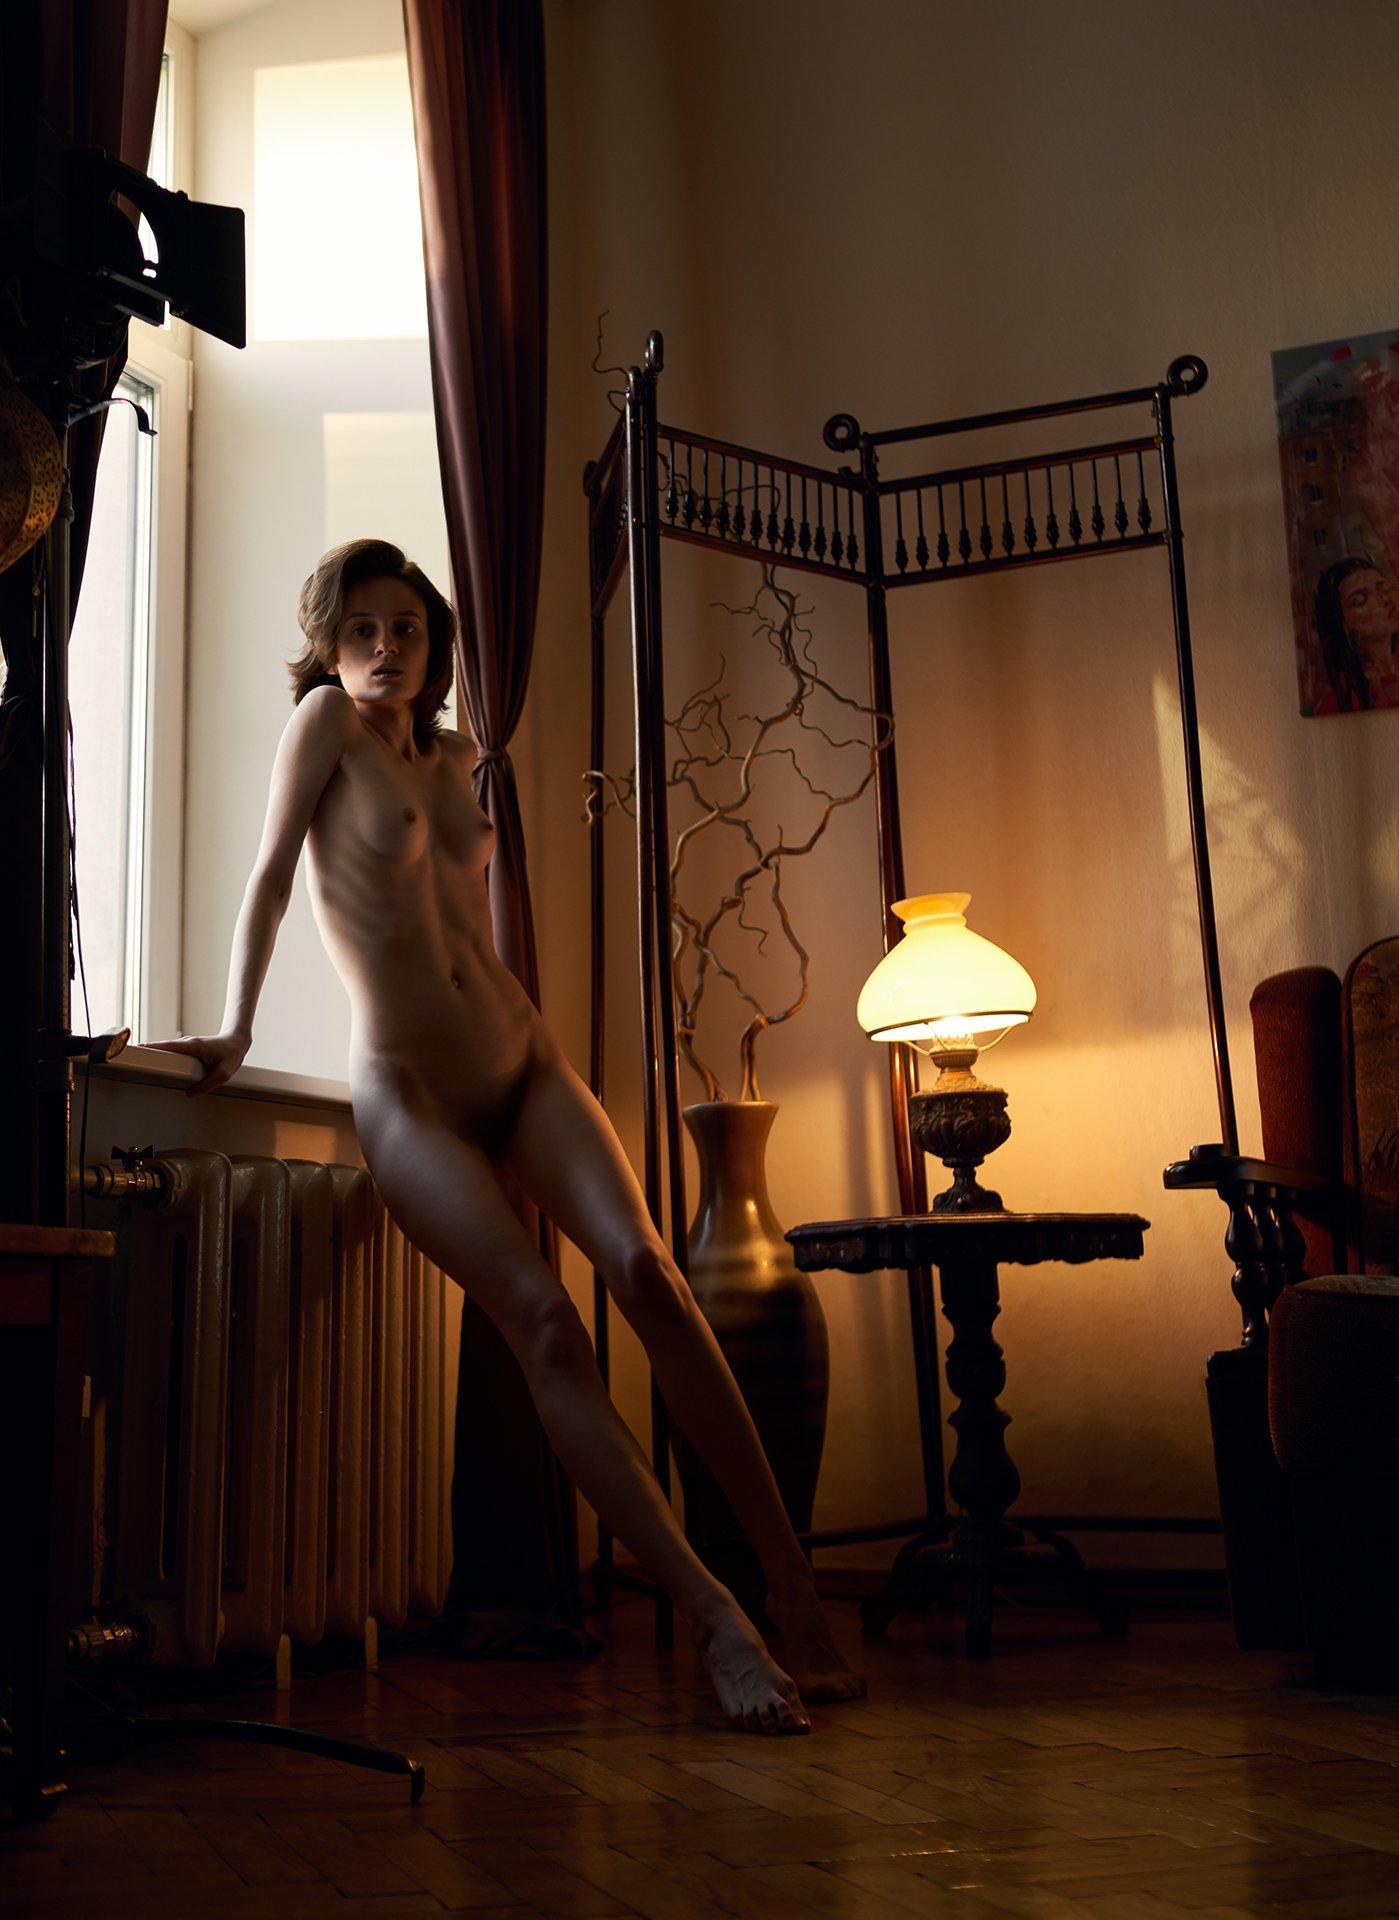 girl, nude, naked, at home, antique, lamp, light, natural light, saint-petersburg, skinny, body, art, Роман Филиппов